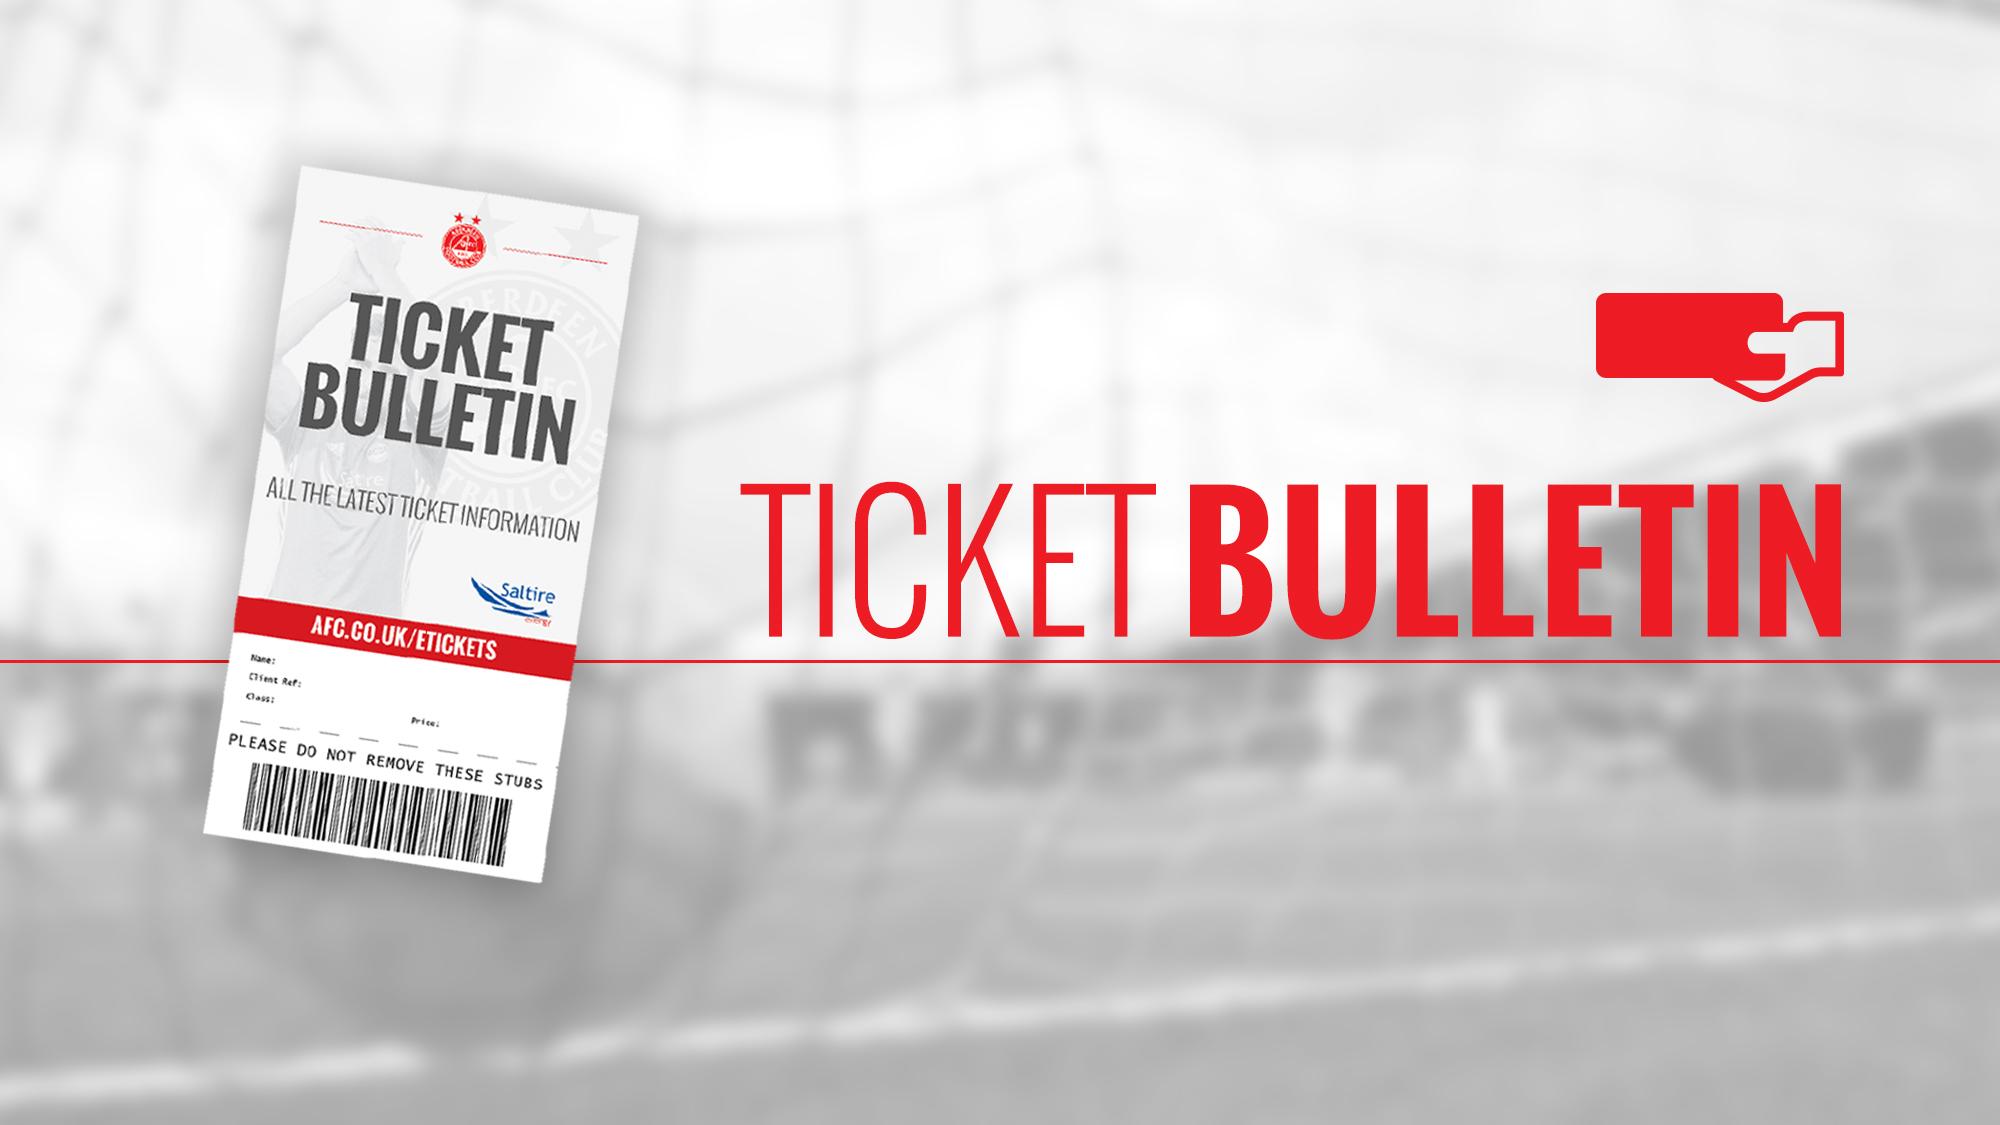 TICKET BULLETIN | MONDAY 12TH AUGUST